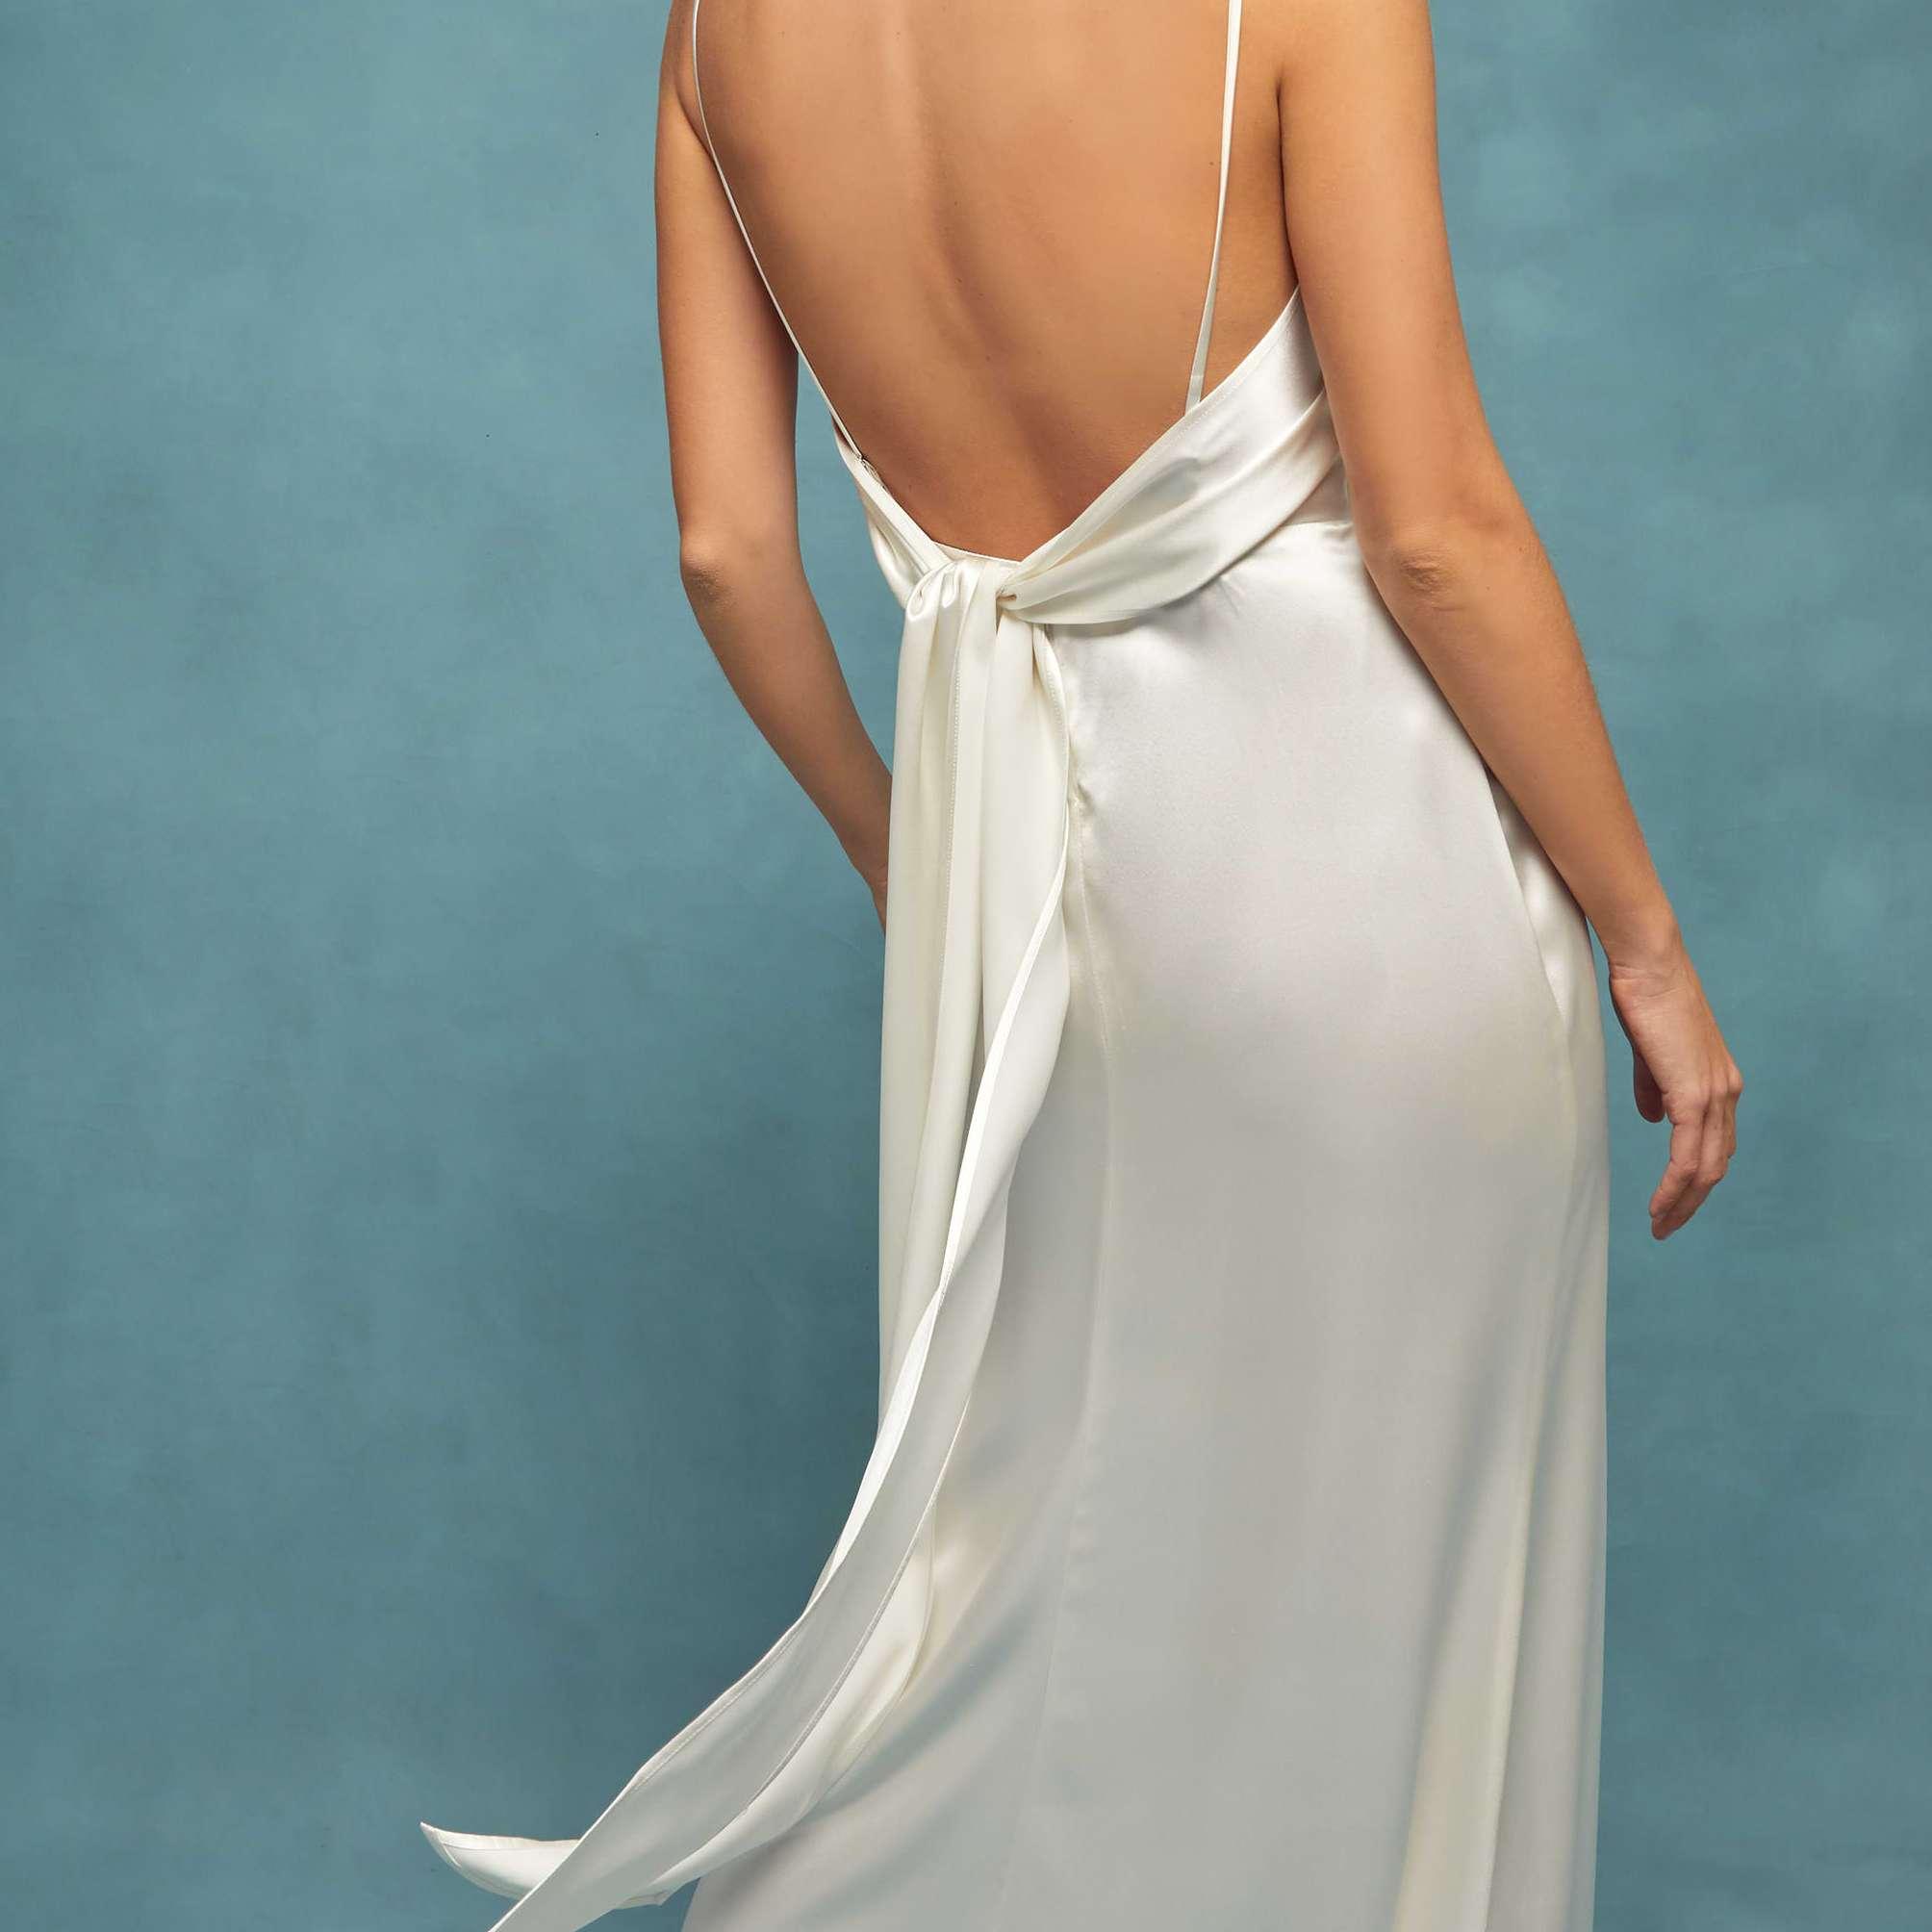 The 30 Best Slip Wedding Dresses Of 2020,Stunning Wedding Guest Dresses Uk